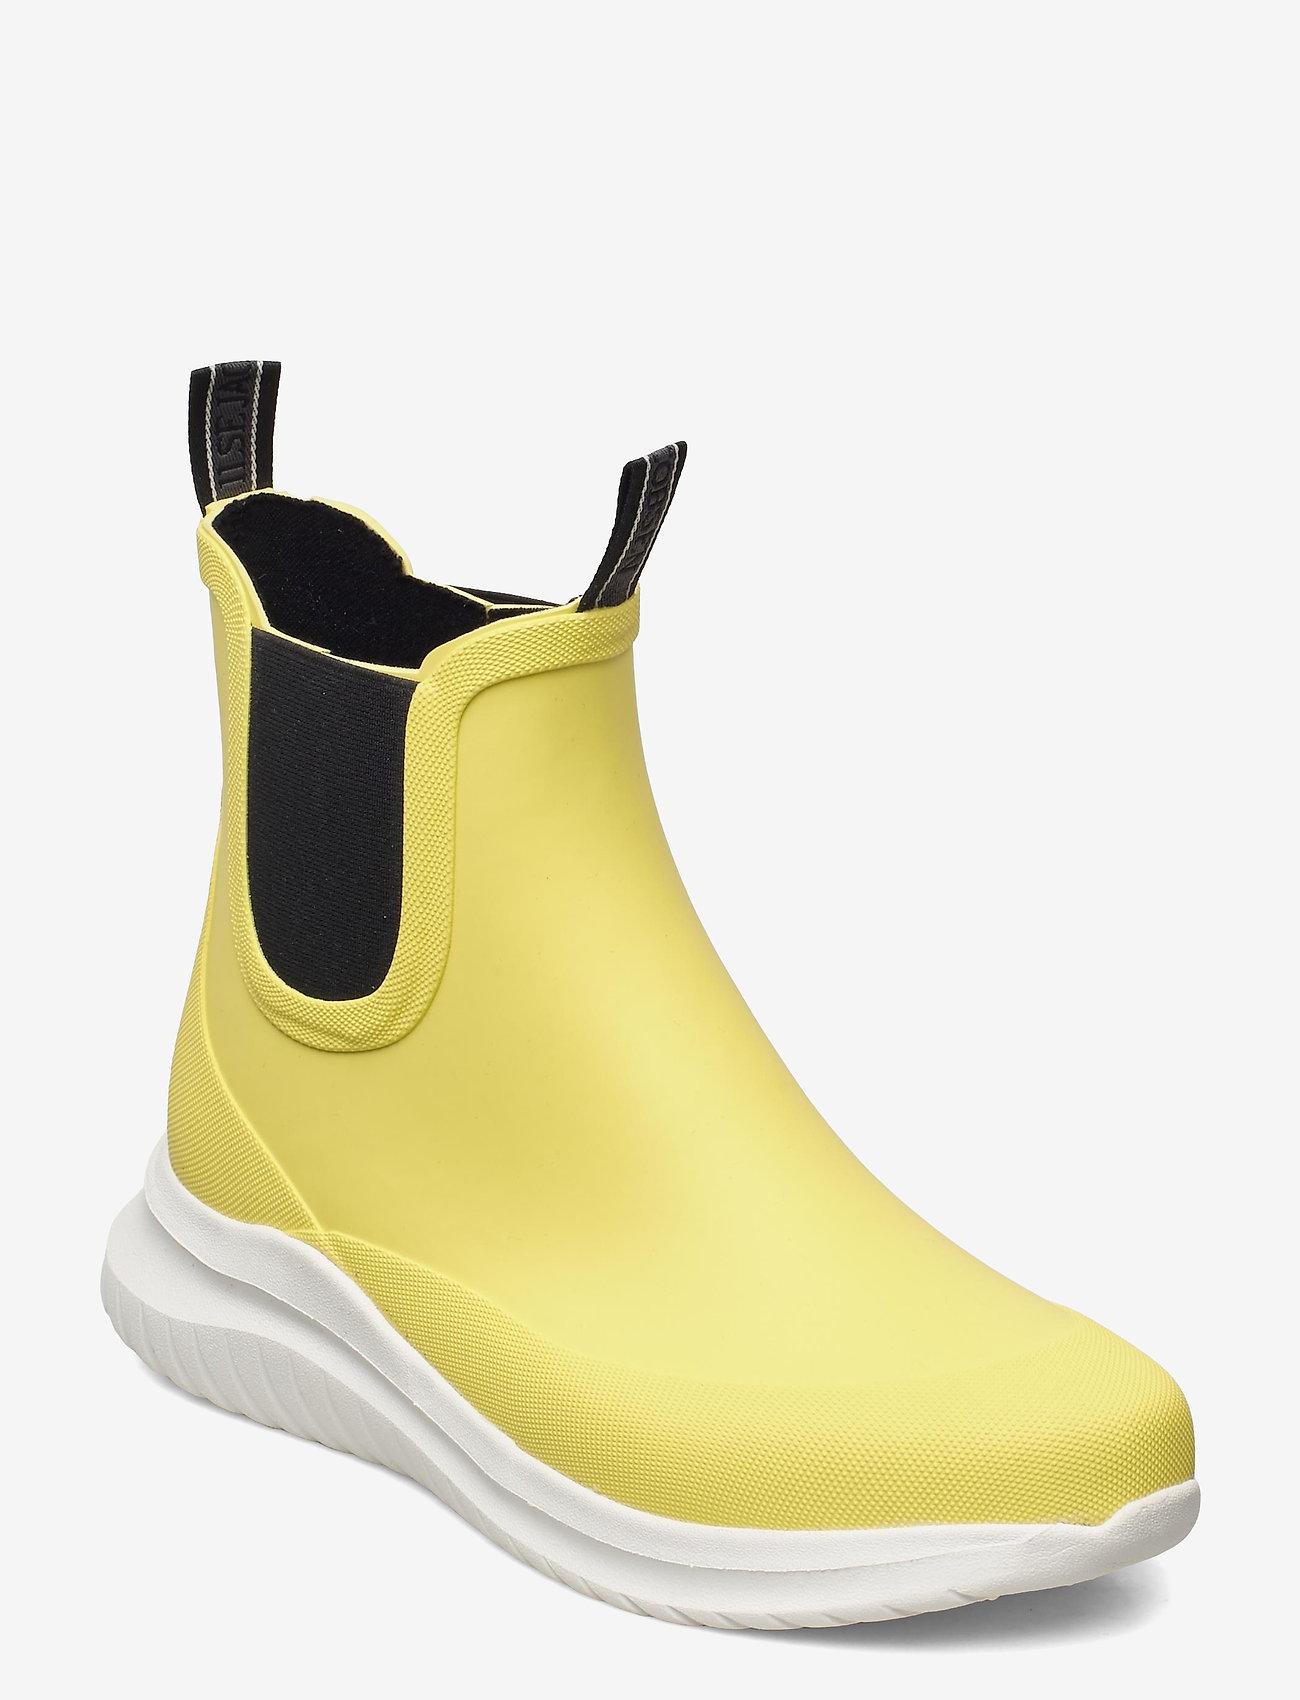 Ilse Jacobsen - Short rubber boots - sko - sunbeam - 0